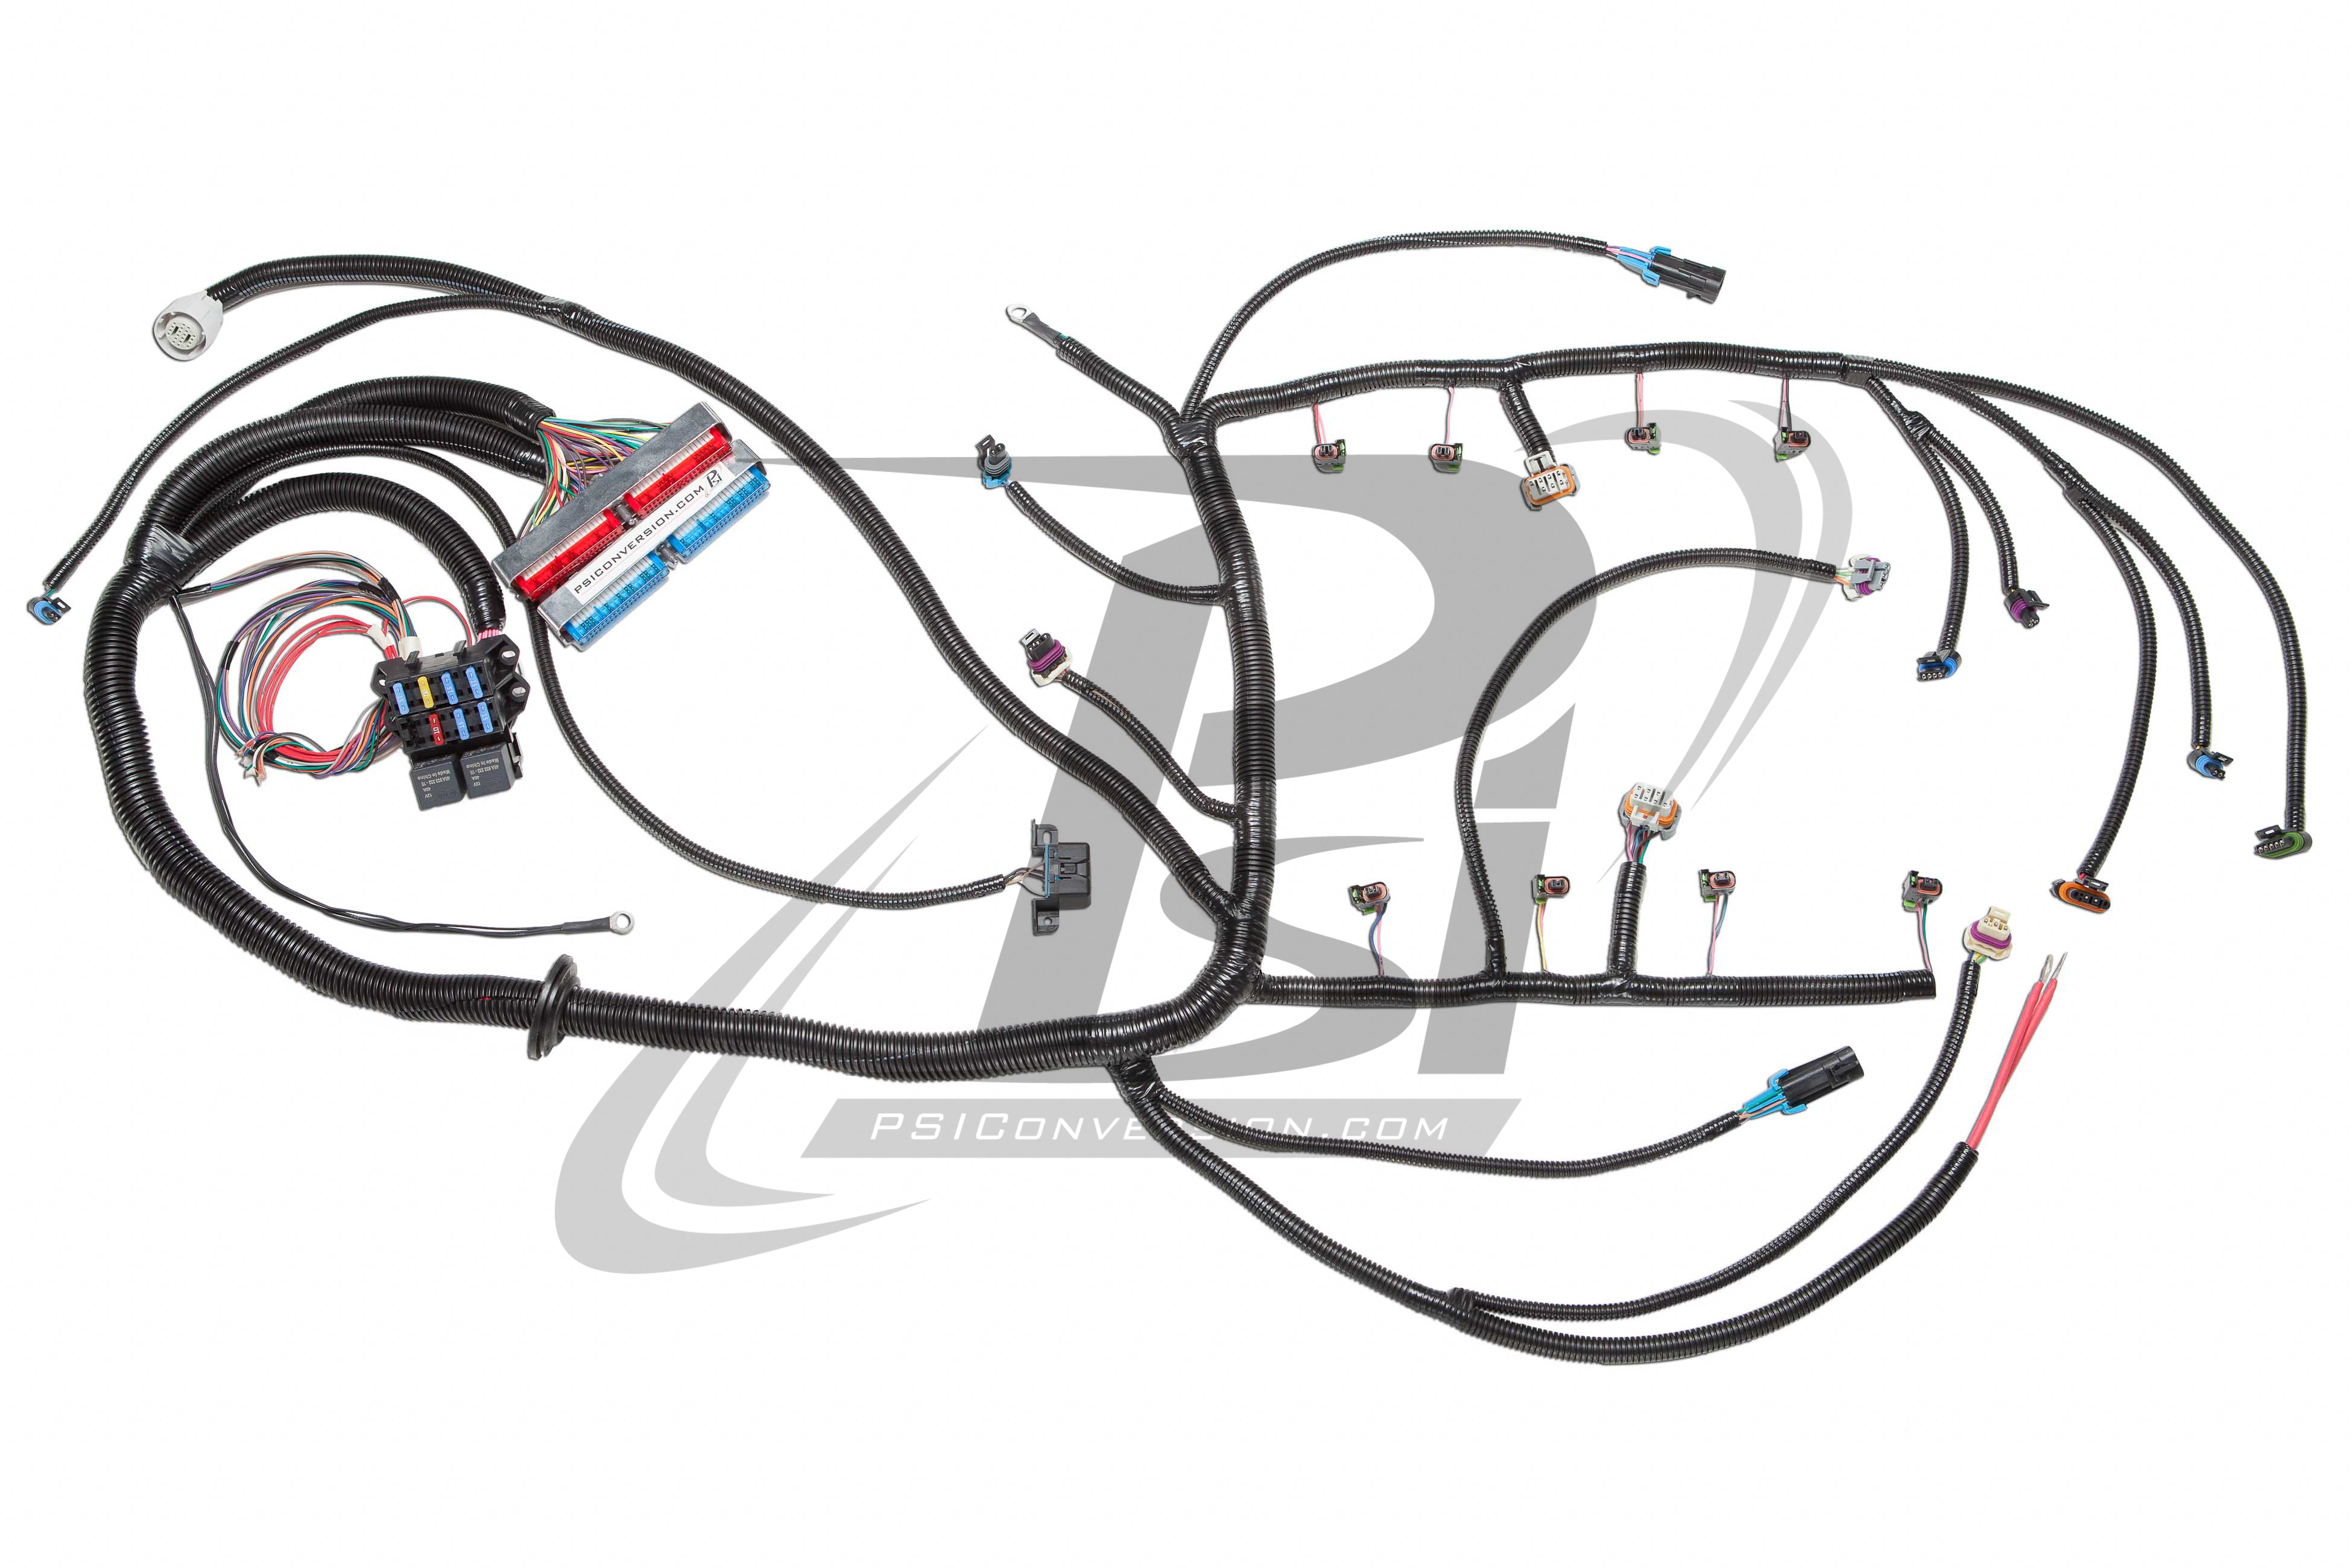 '99 - '06 VORTEC (DBC) w/ 4L60E w/ Multec Injectors & 5 pin MAF Standalone  L E Wiring Harness Diagram Old To New on 4l80e pump diagram, 4l80e speed sensor diagram, 4l80e electrical diagram, 4l80e neutral safety switch diagram, 4l60e automatic transmission parts diagram, 4l60e transmission exploded view diagram, 4l80e transmission diagram, 4l80e solenoid diagram,